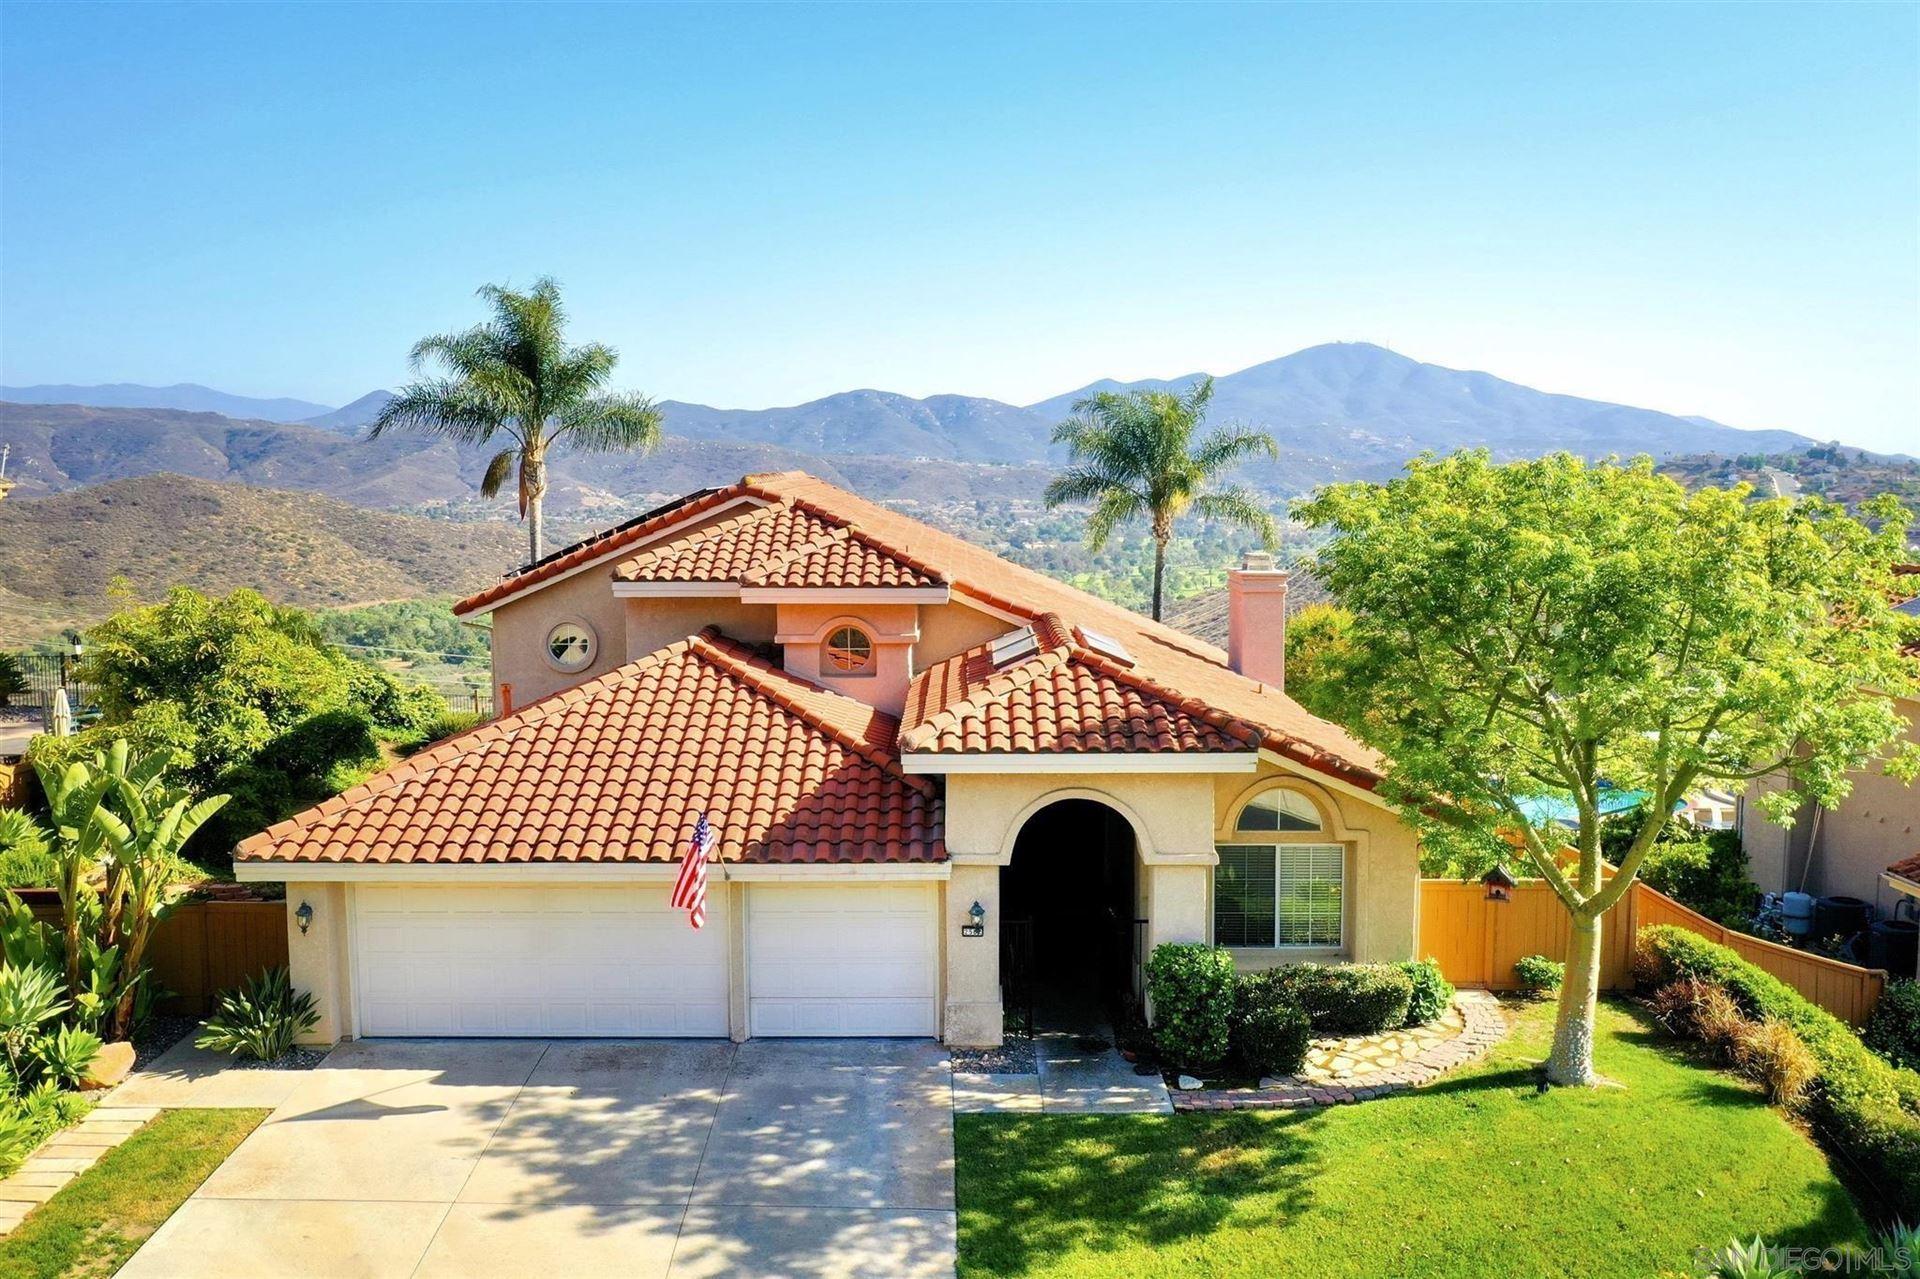 Photo of 2562 Castellon Terrace, El Cajon, CA 92019 (MLS # 210024705)